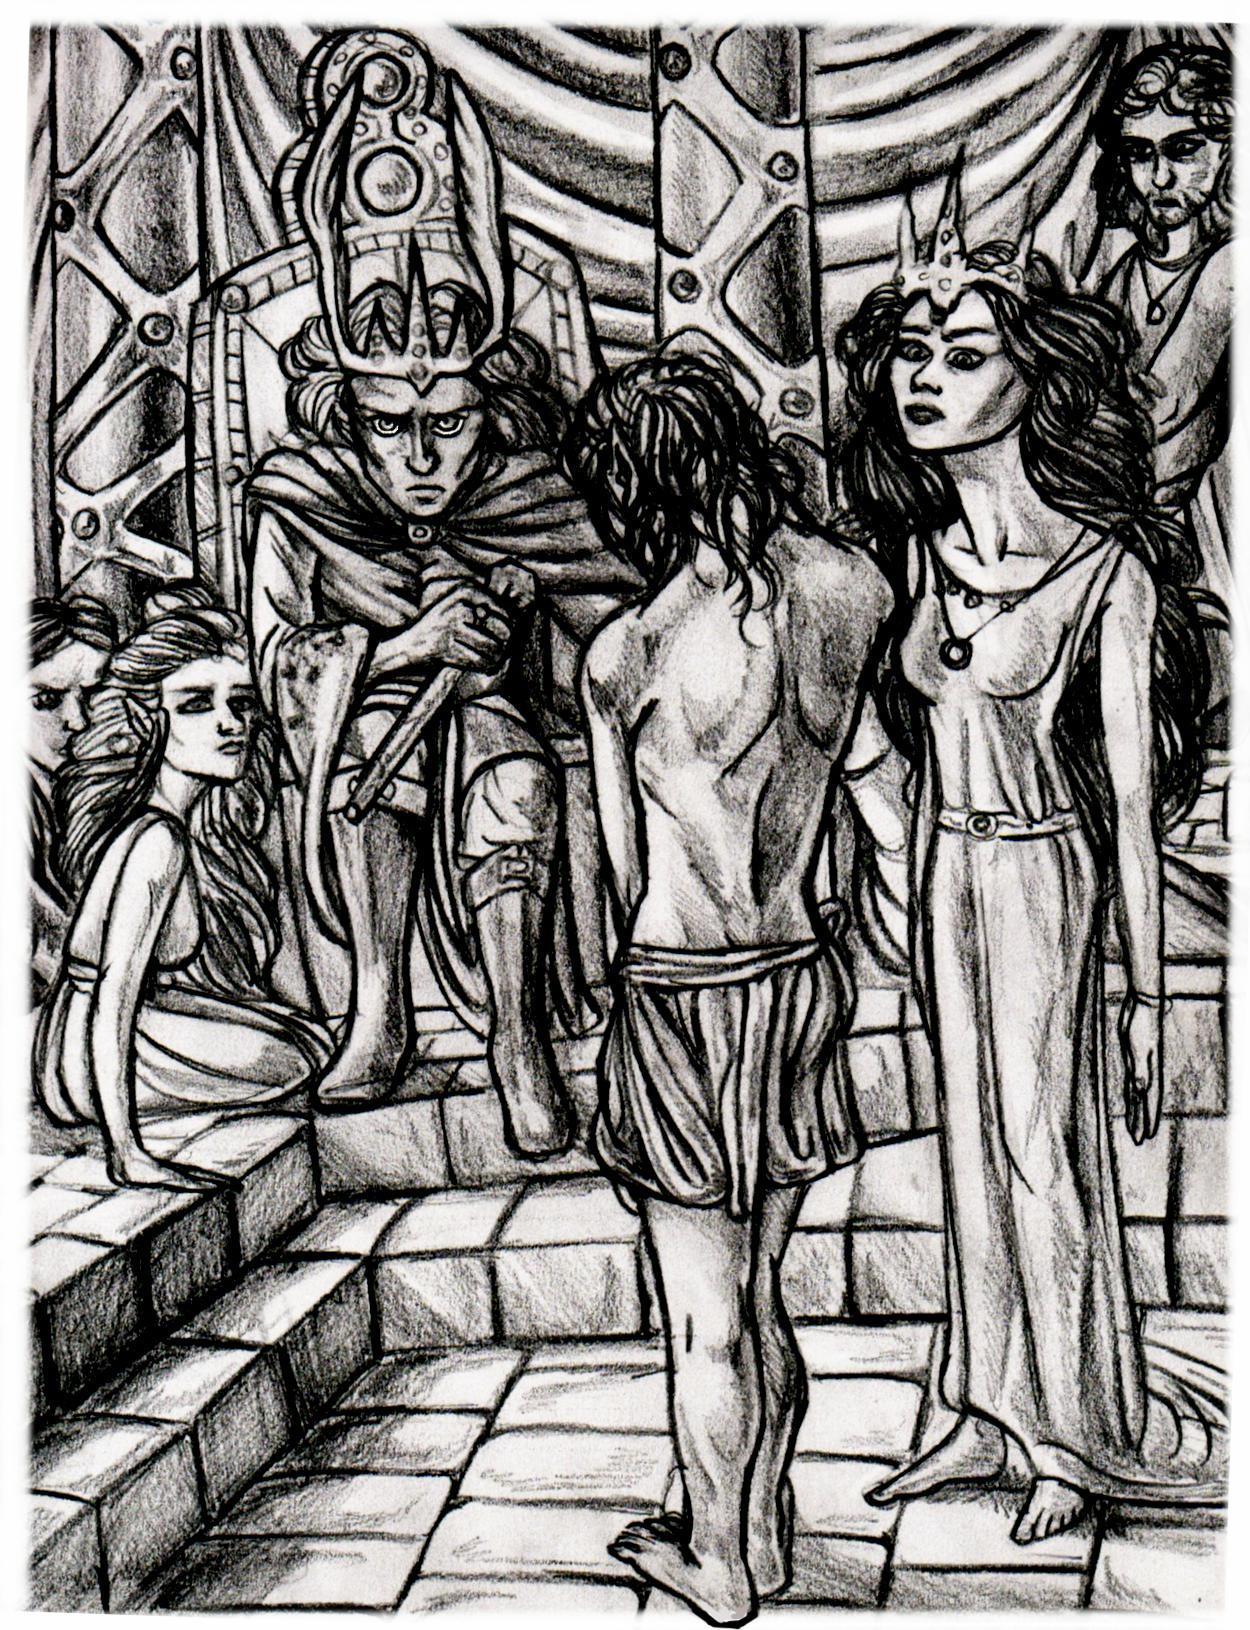 Melkor's Release by felegund